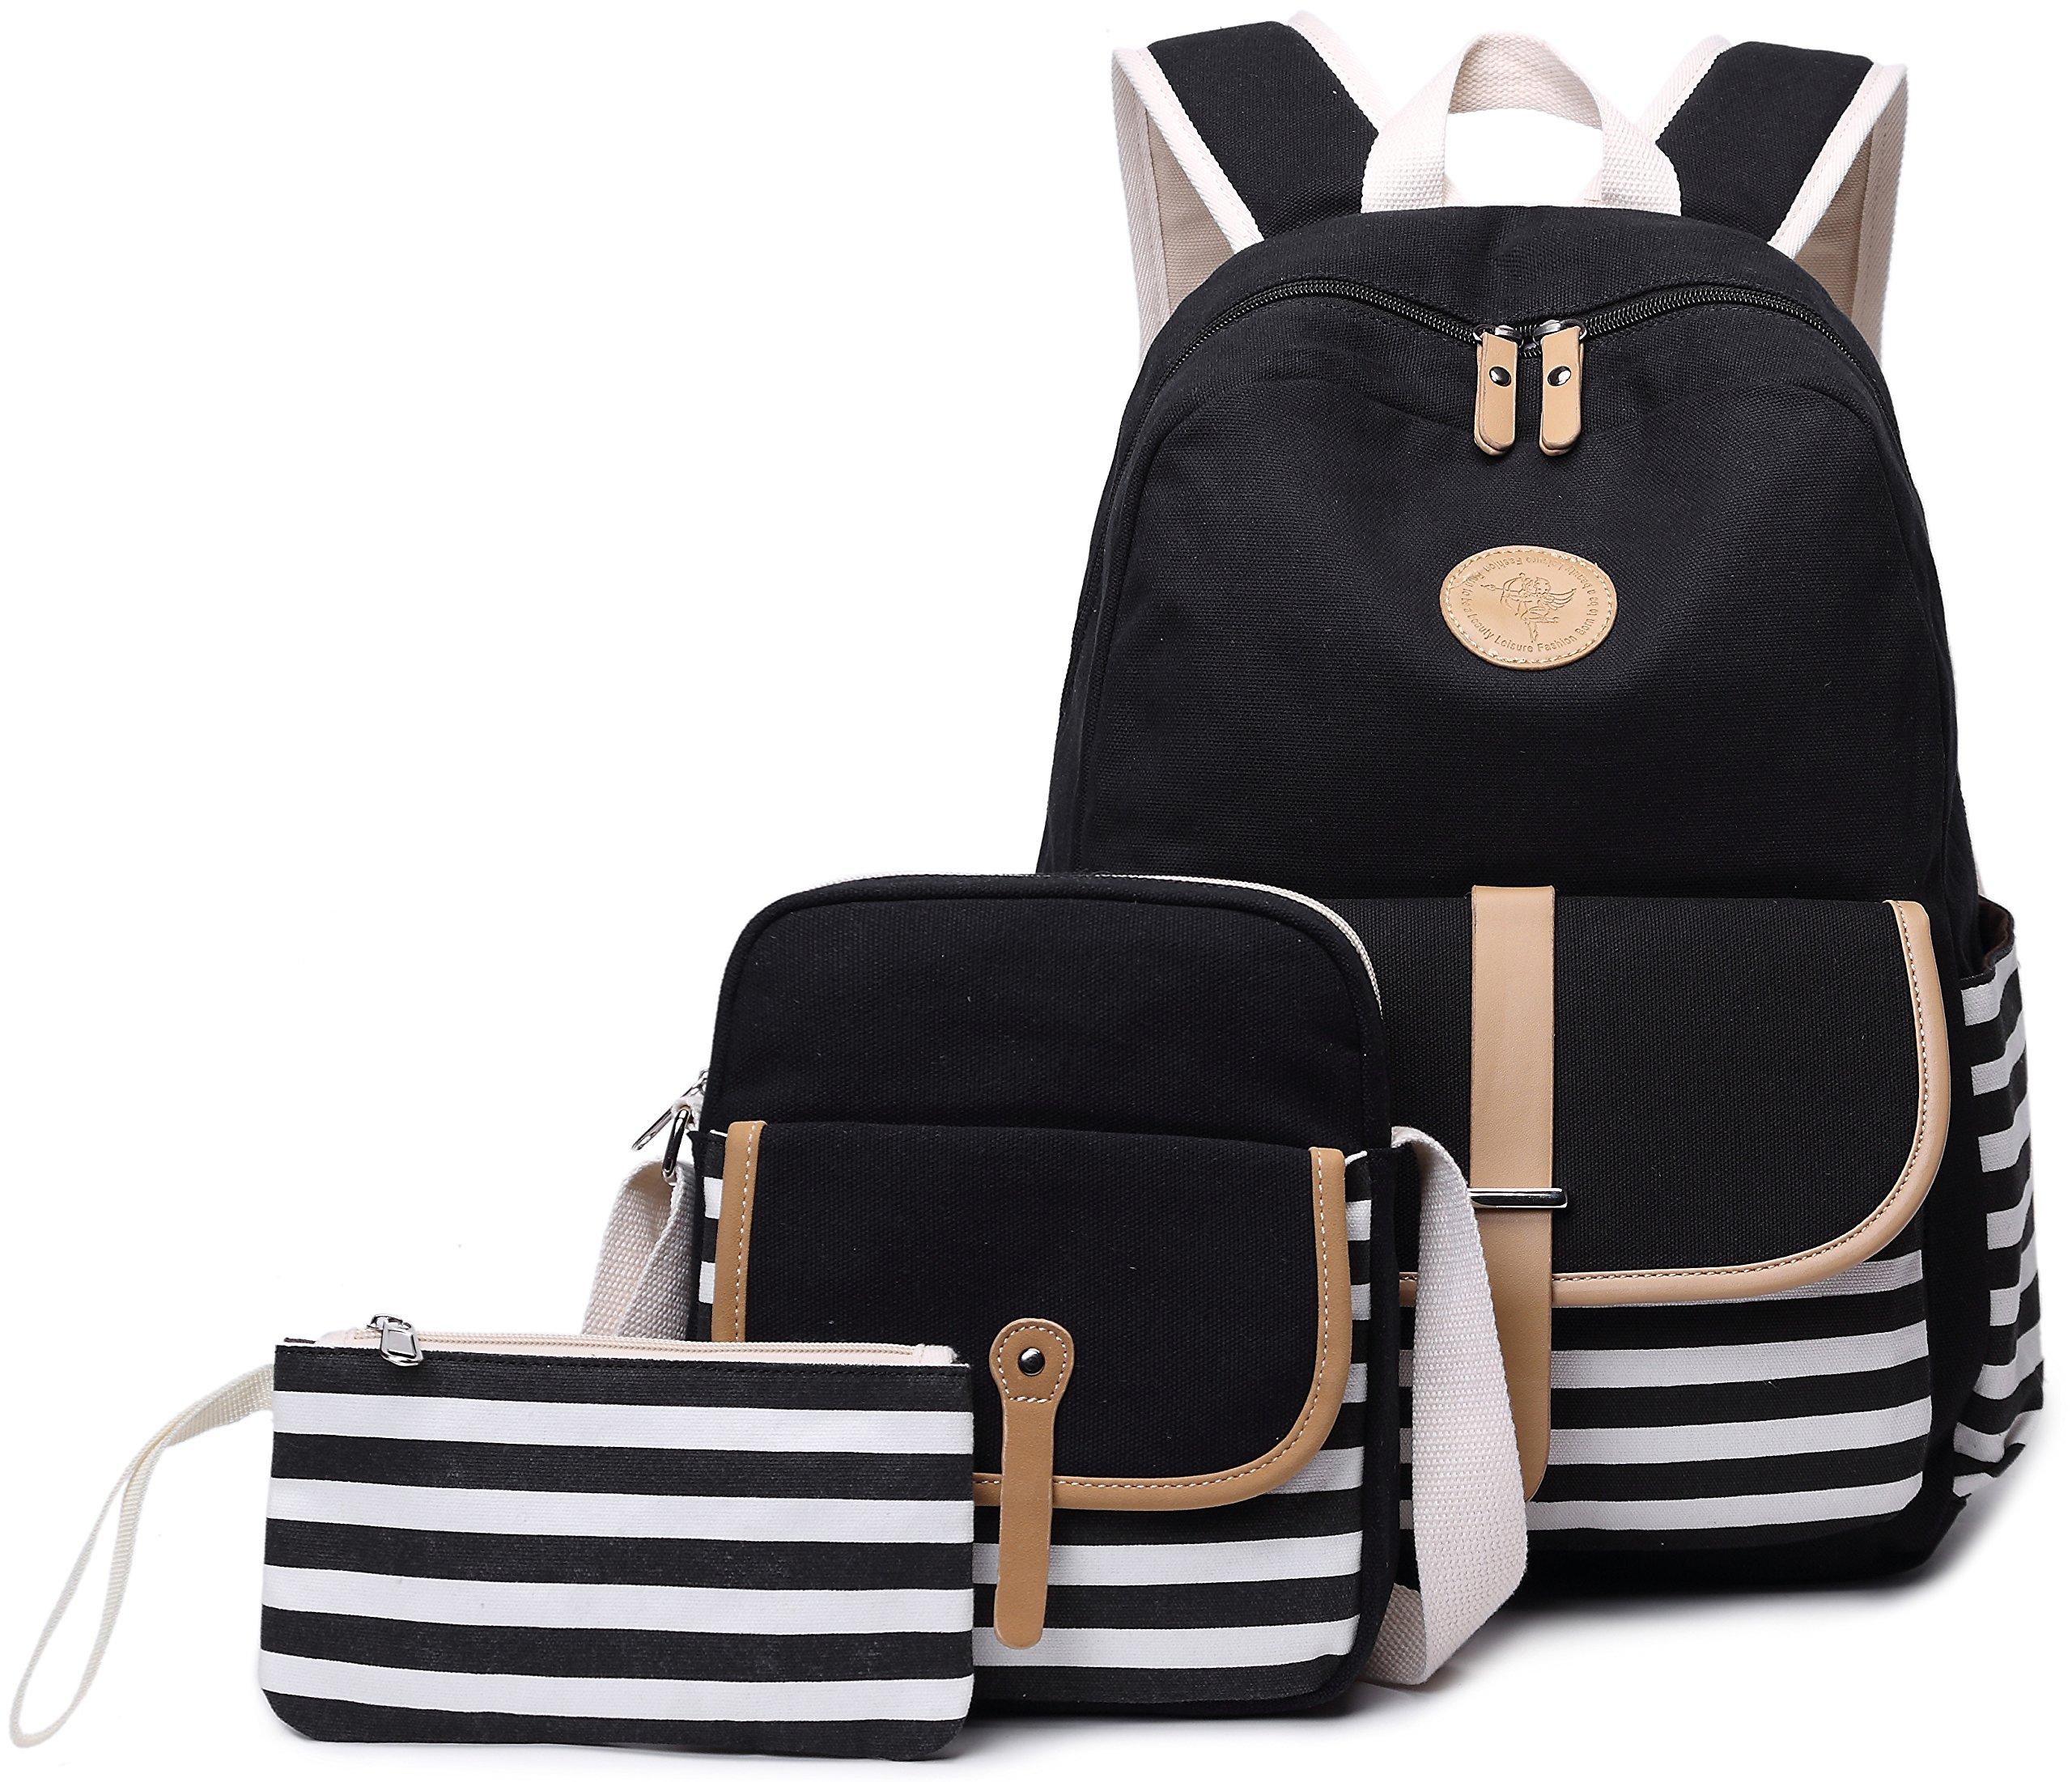 School Backpack for Girls, Gazigo Womens High School College Bookbags Laptop Bag (Black) by Gazigo (Image #3)